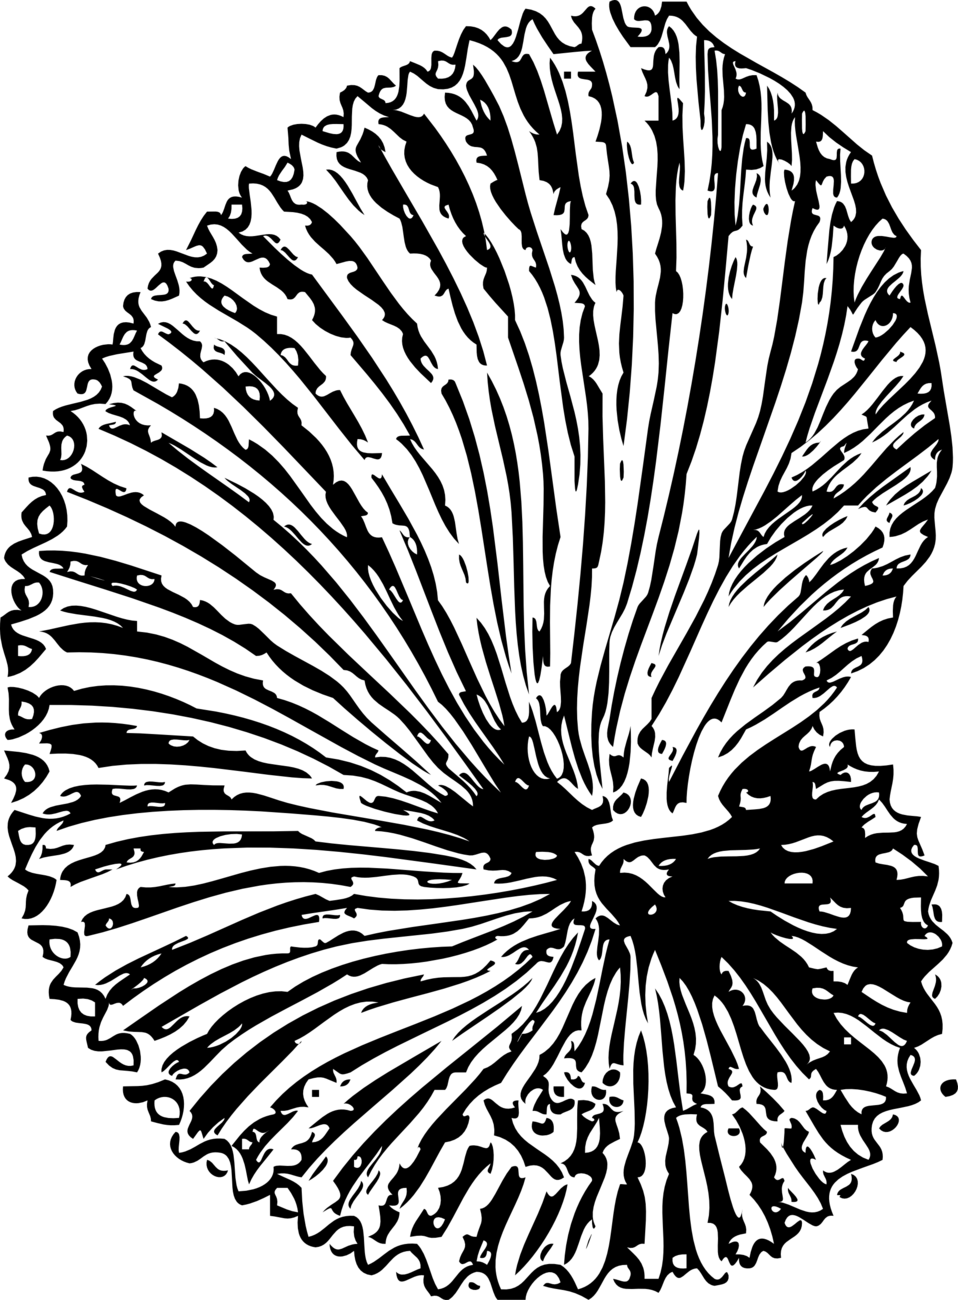 Public domain clip art. Shell clipart fossil